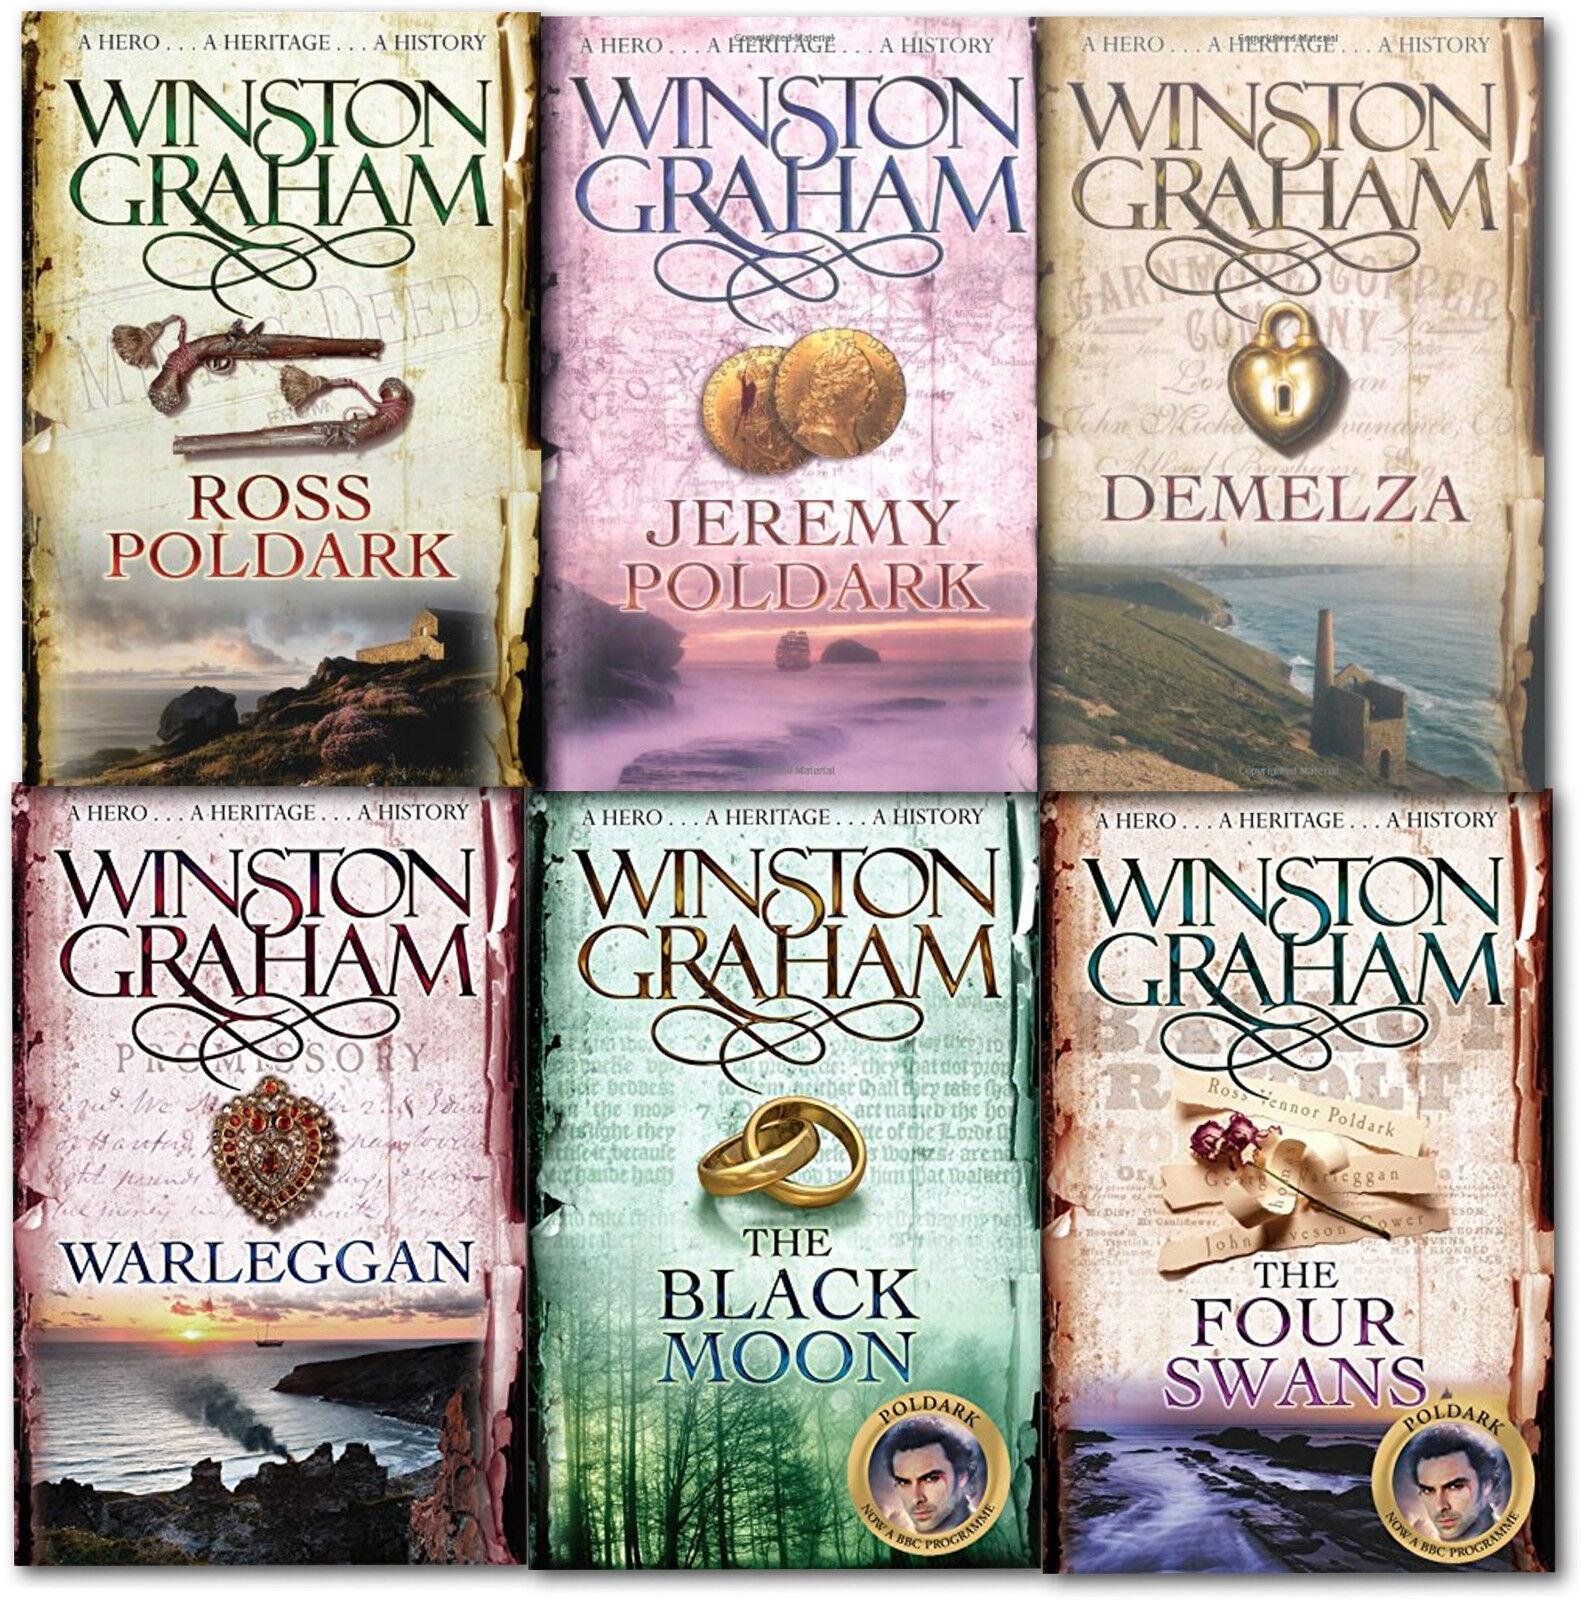 Winston Graham Poldark Series 6 Books Collection New A Novel